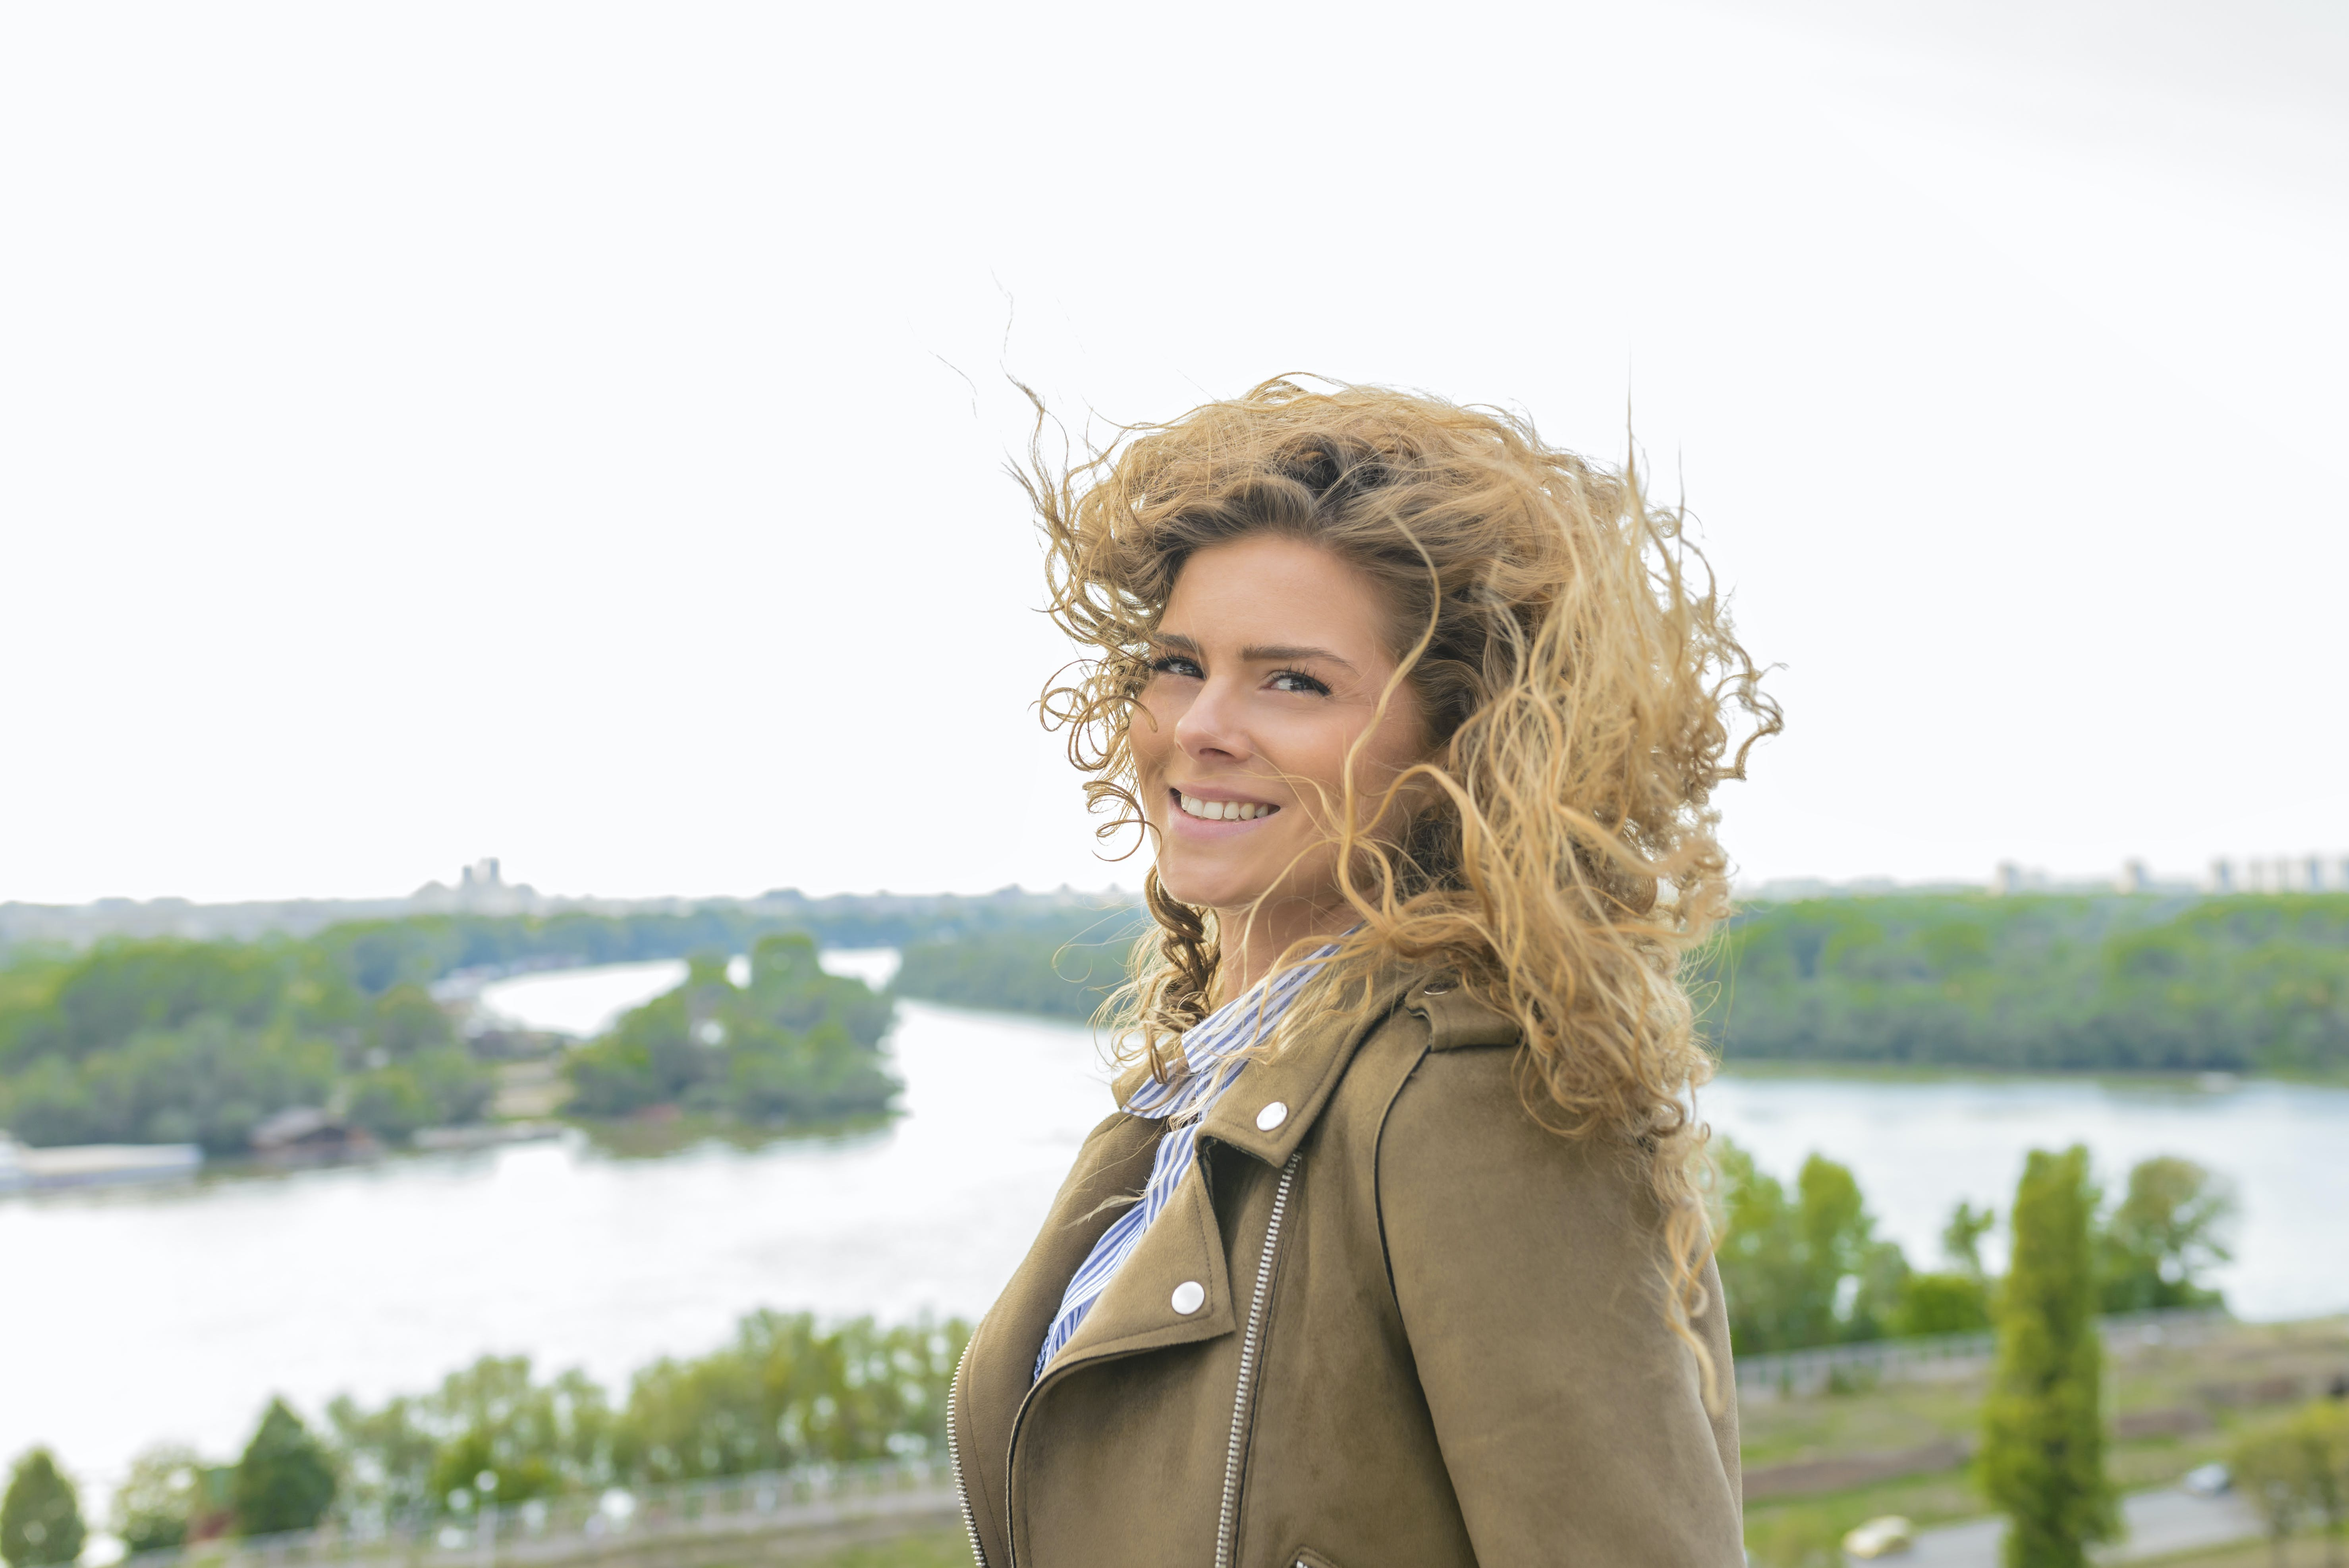 Woman Wearing Brown Coat Smiling